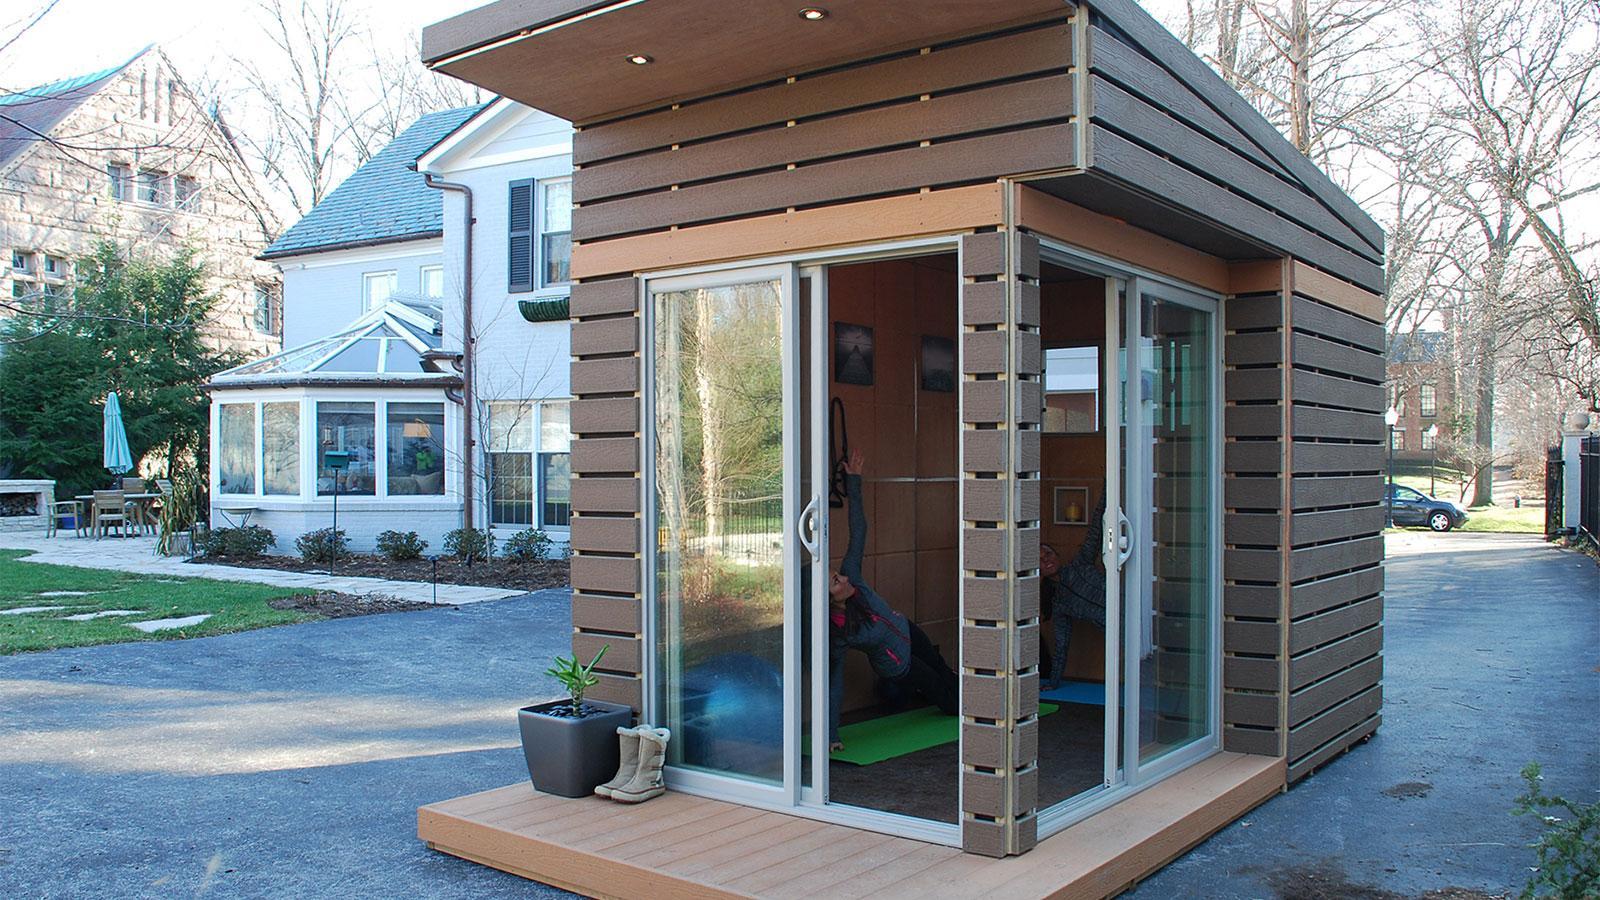 100 Hive Modular Homes Modular Home Modular Homes